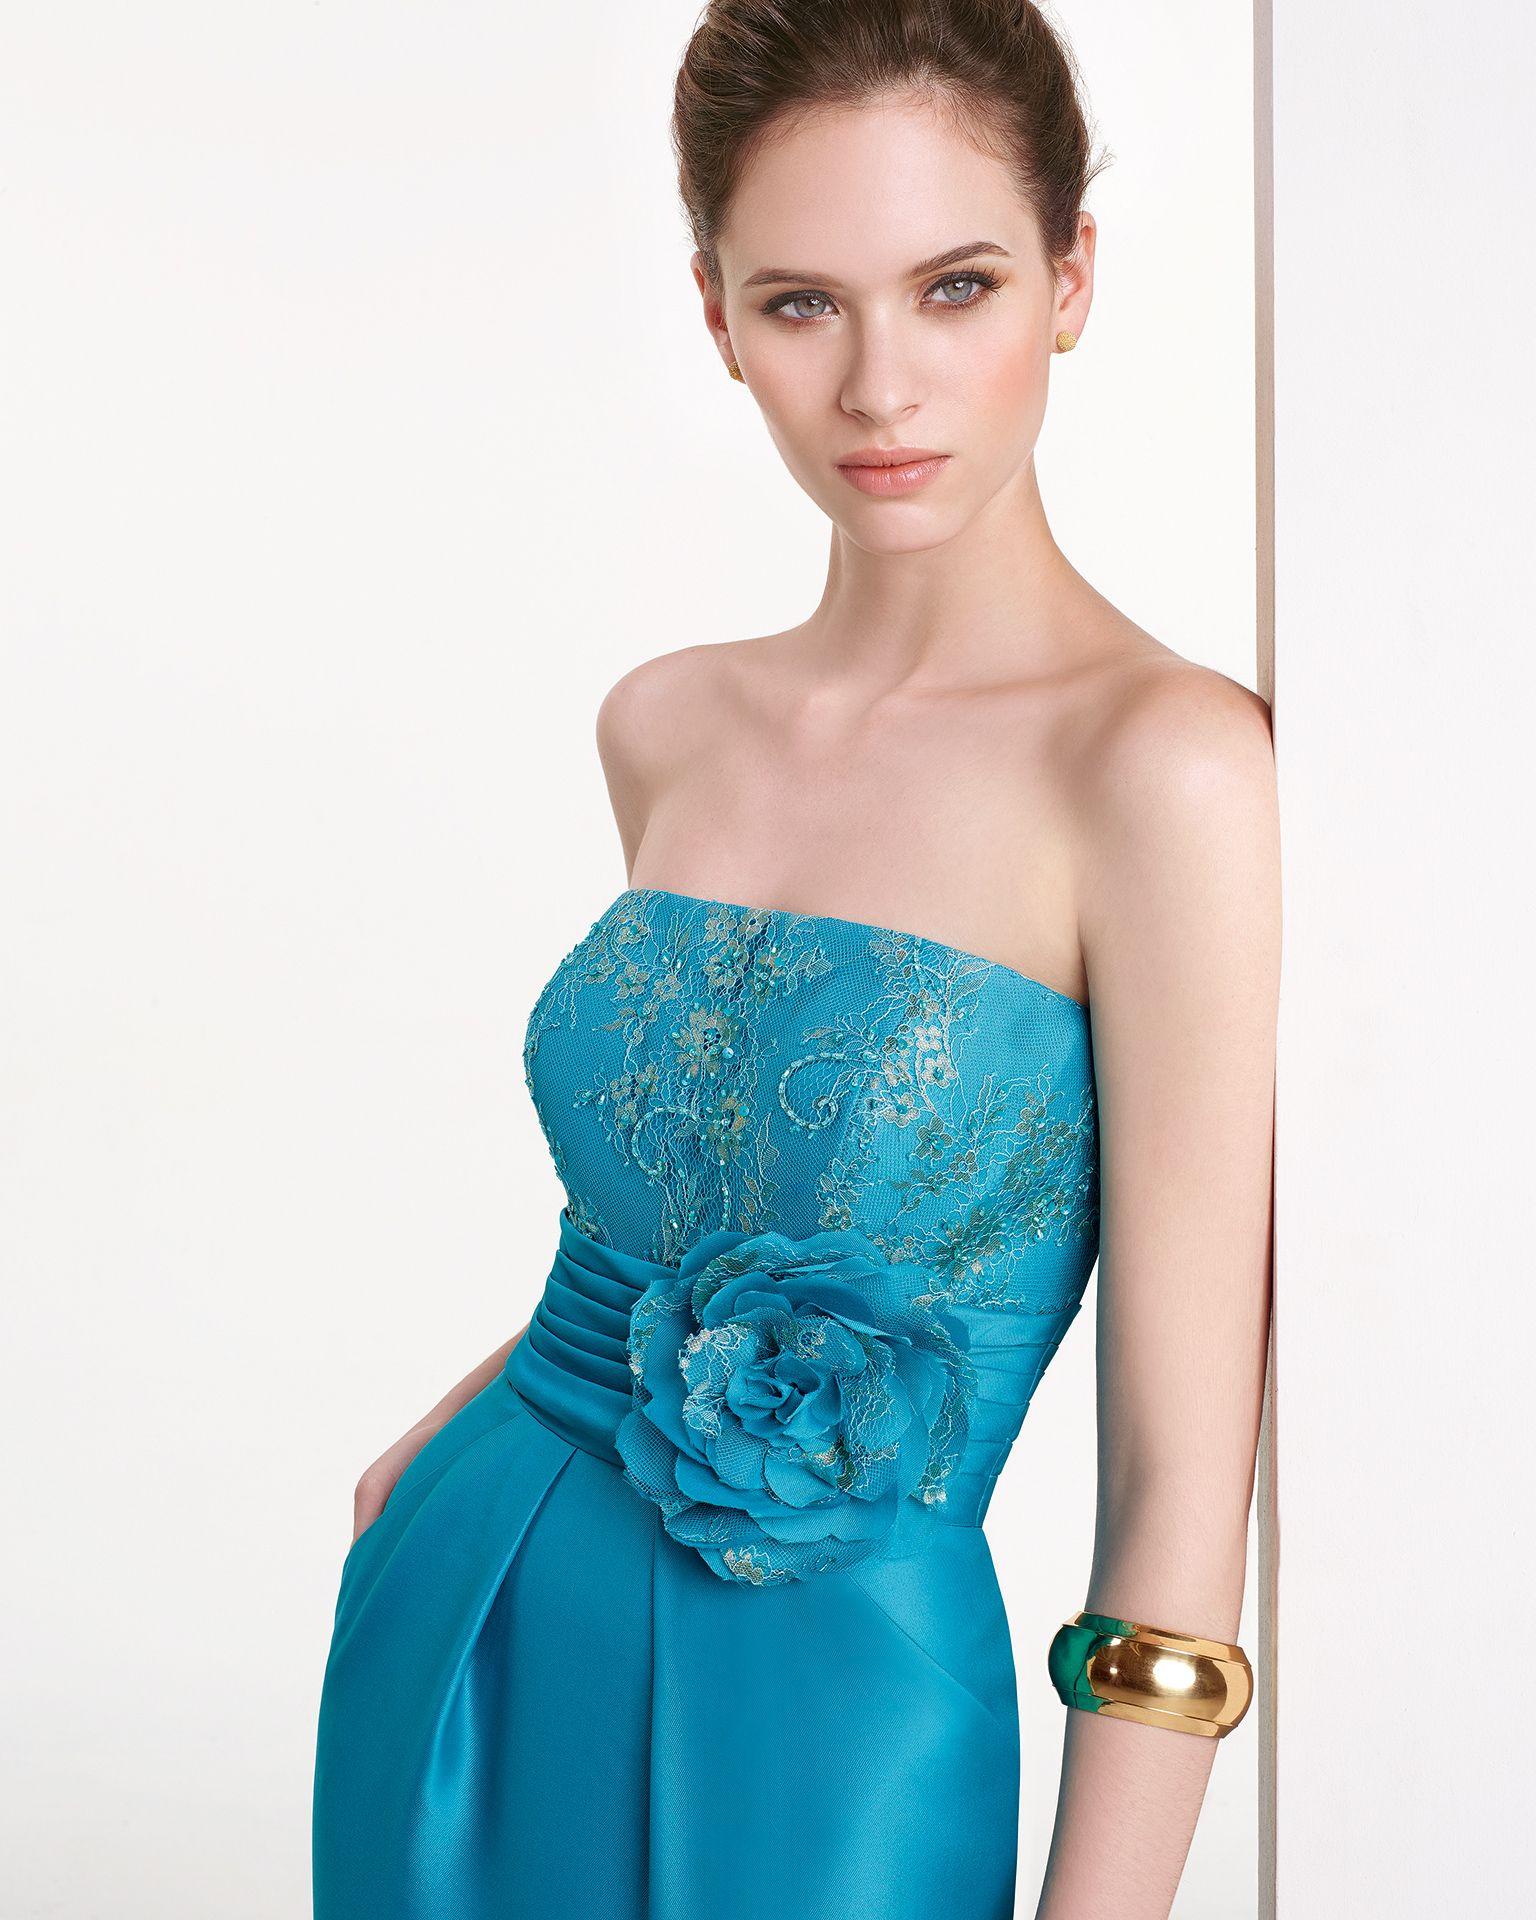 Cool Vestidos De Novia En Jaen Pictures Inspiration - Wedding Ideas ...